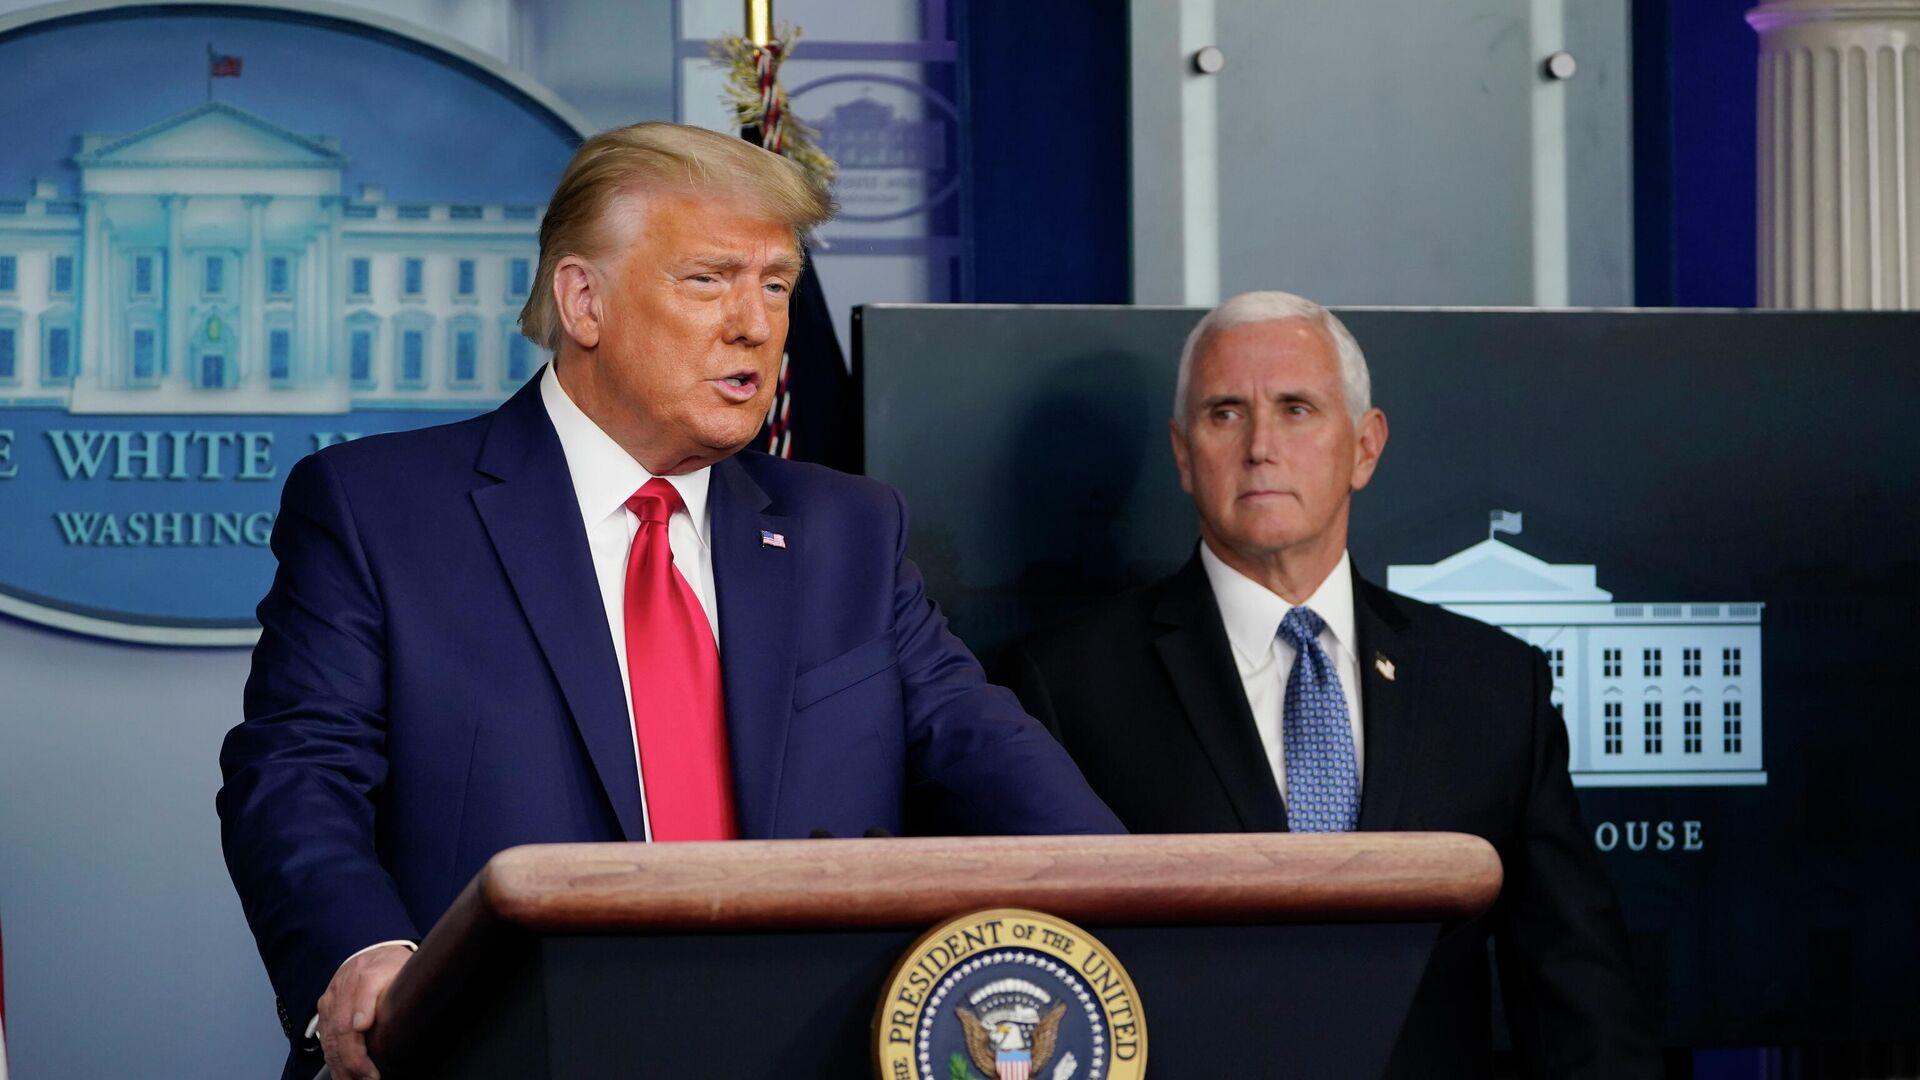 СМИ: Трамп и Пенс не разговаривали после штурма Капитолия